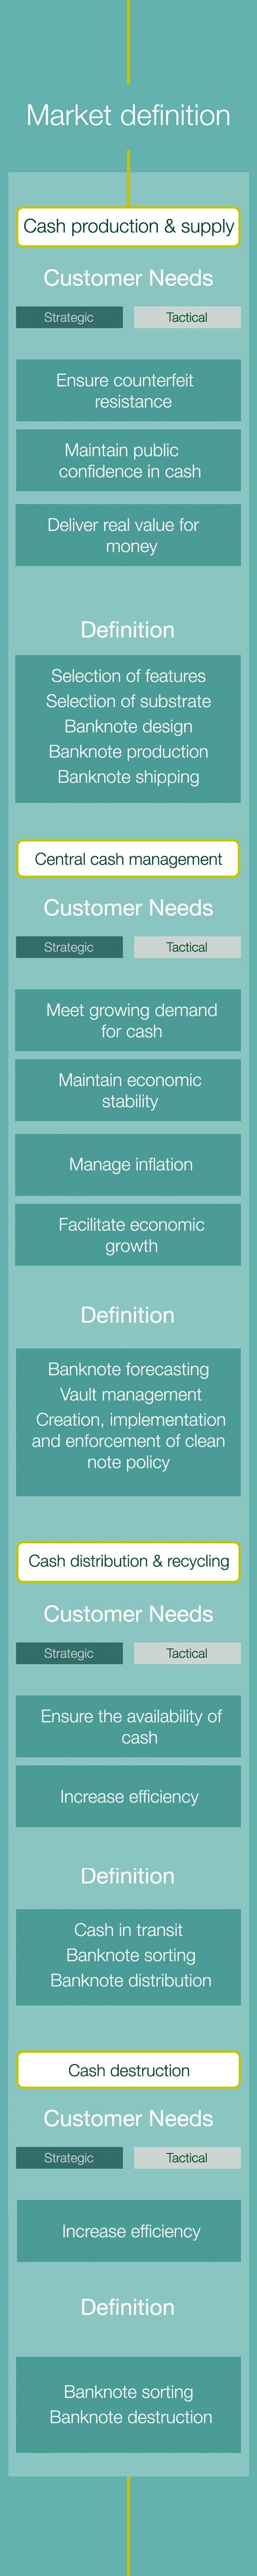 Description of the banknote market